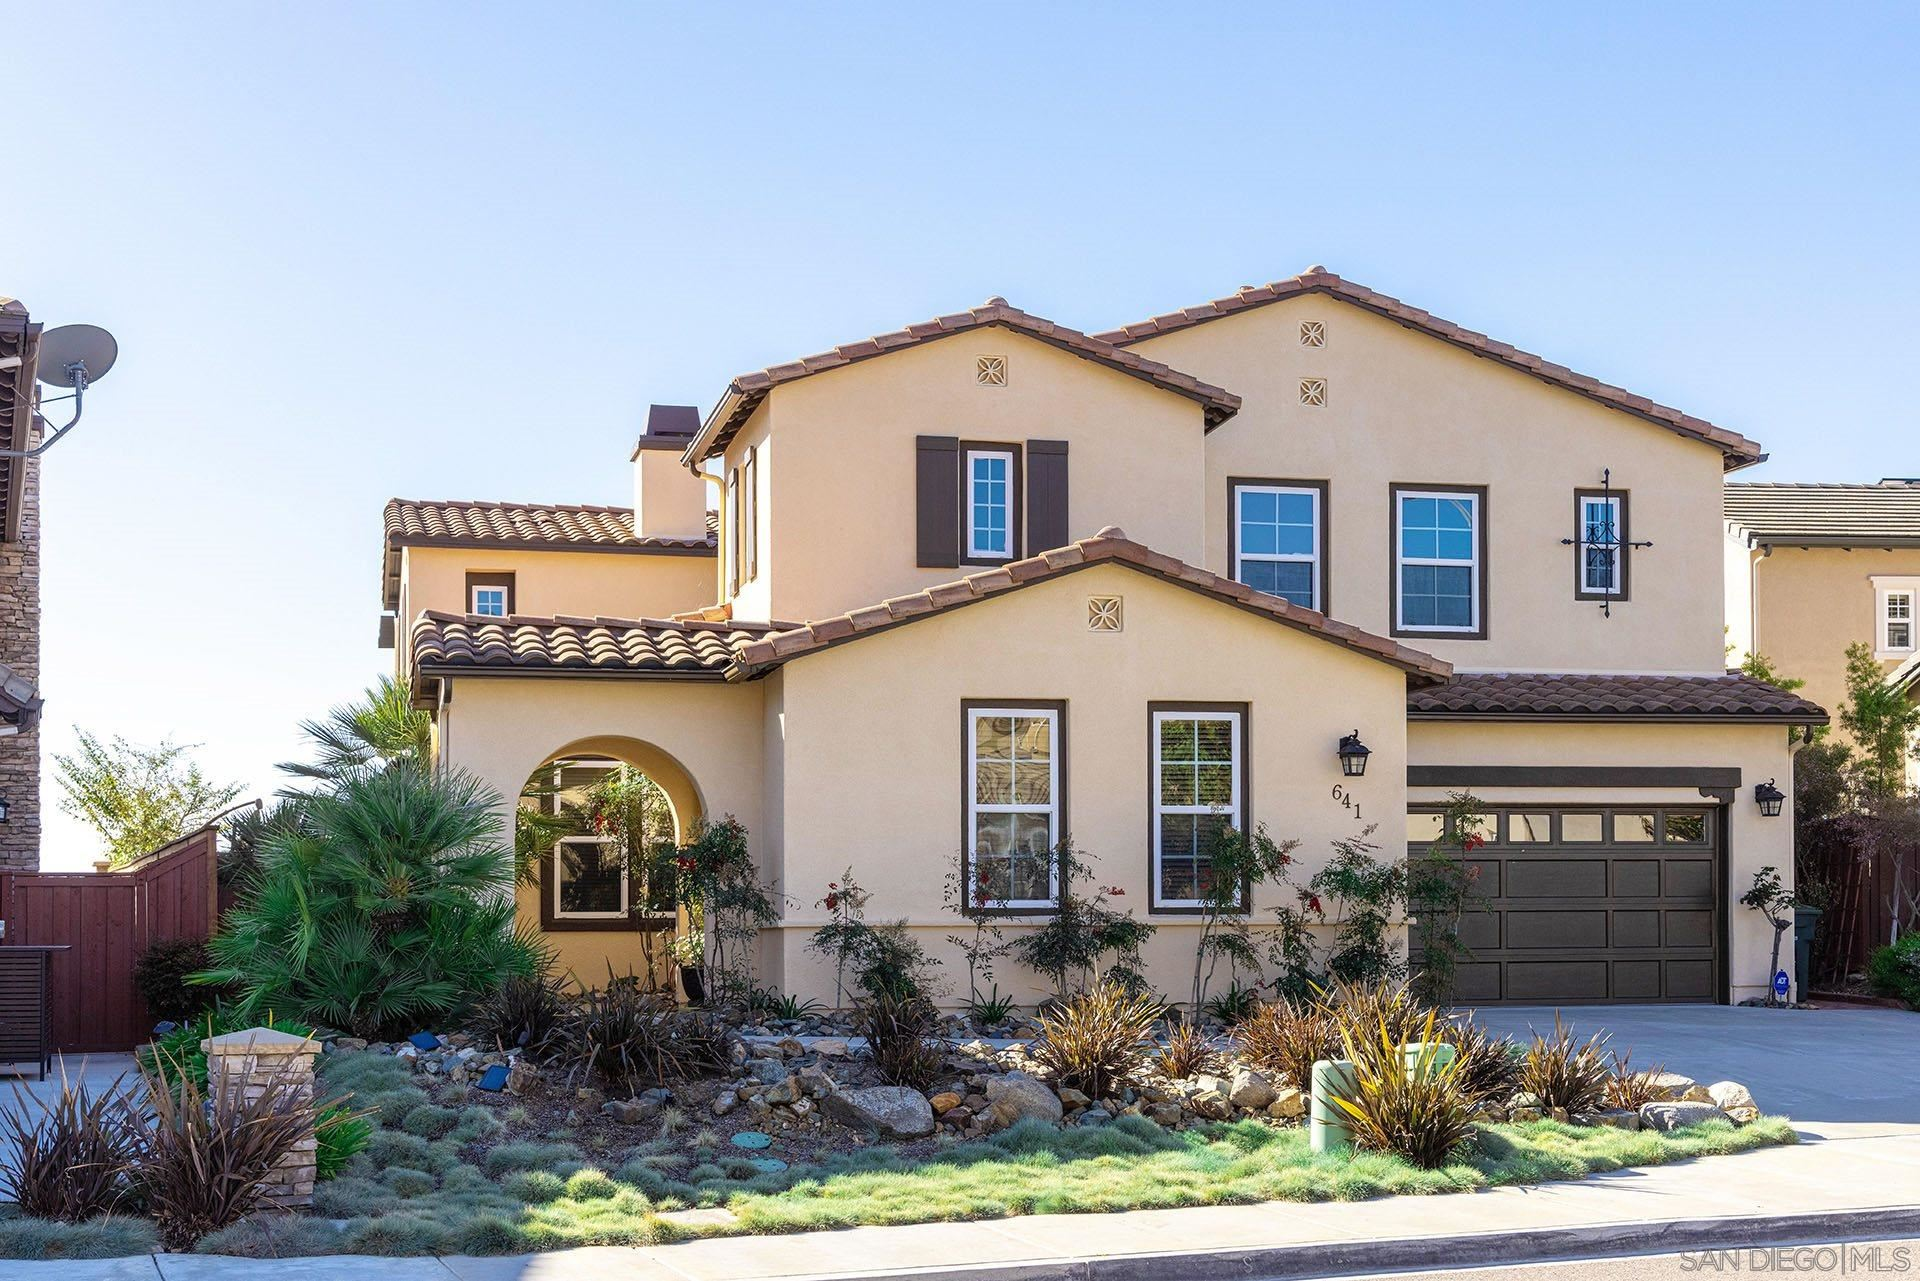 Photo of 641 Atherton St, San Marcos, CA 92078 (MLS # 210009606)